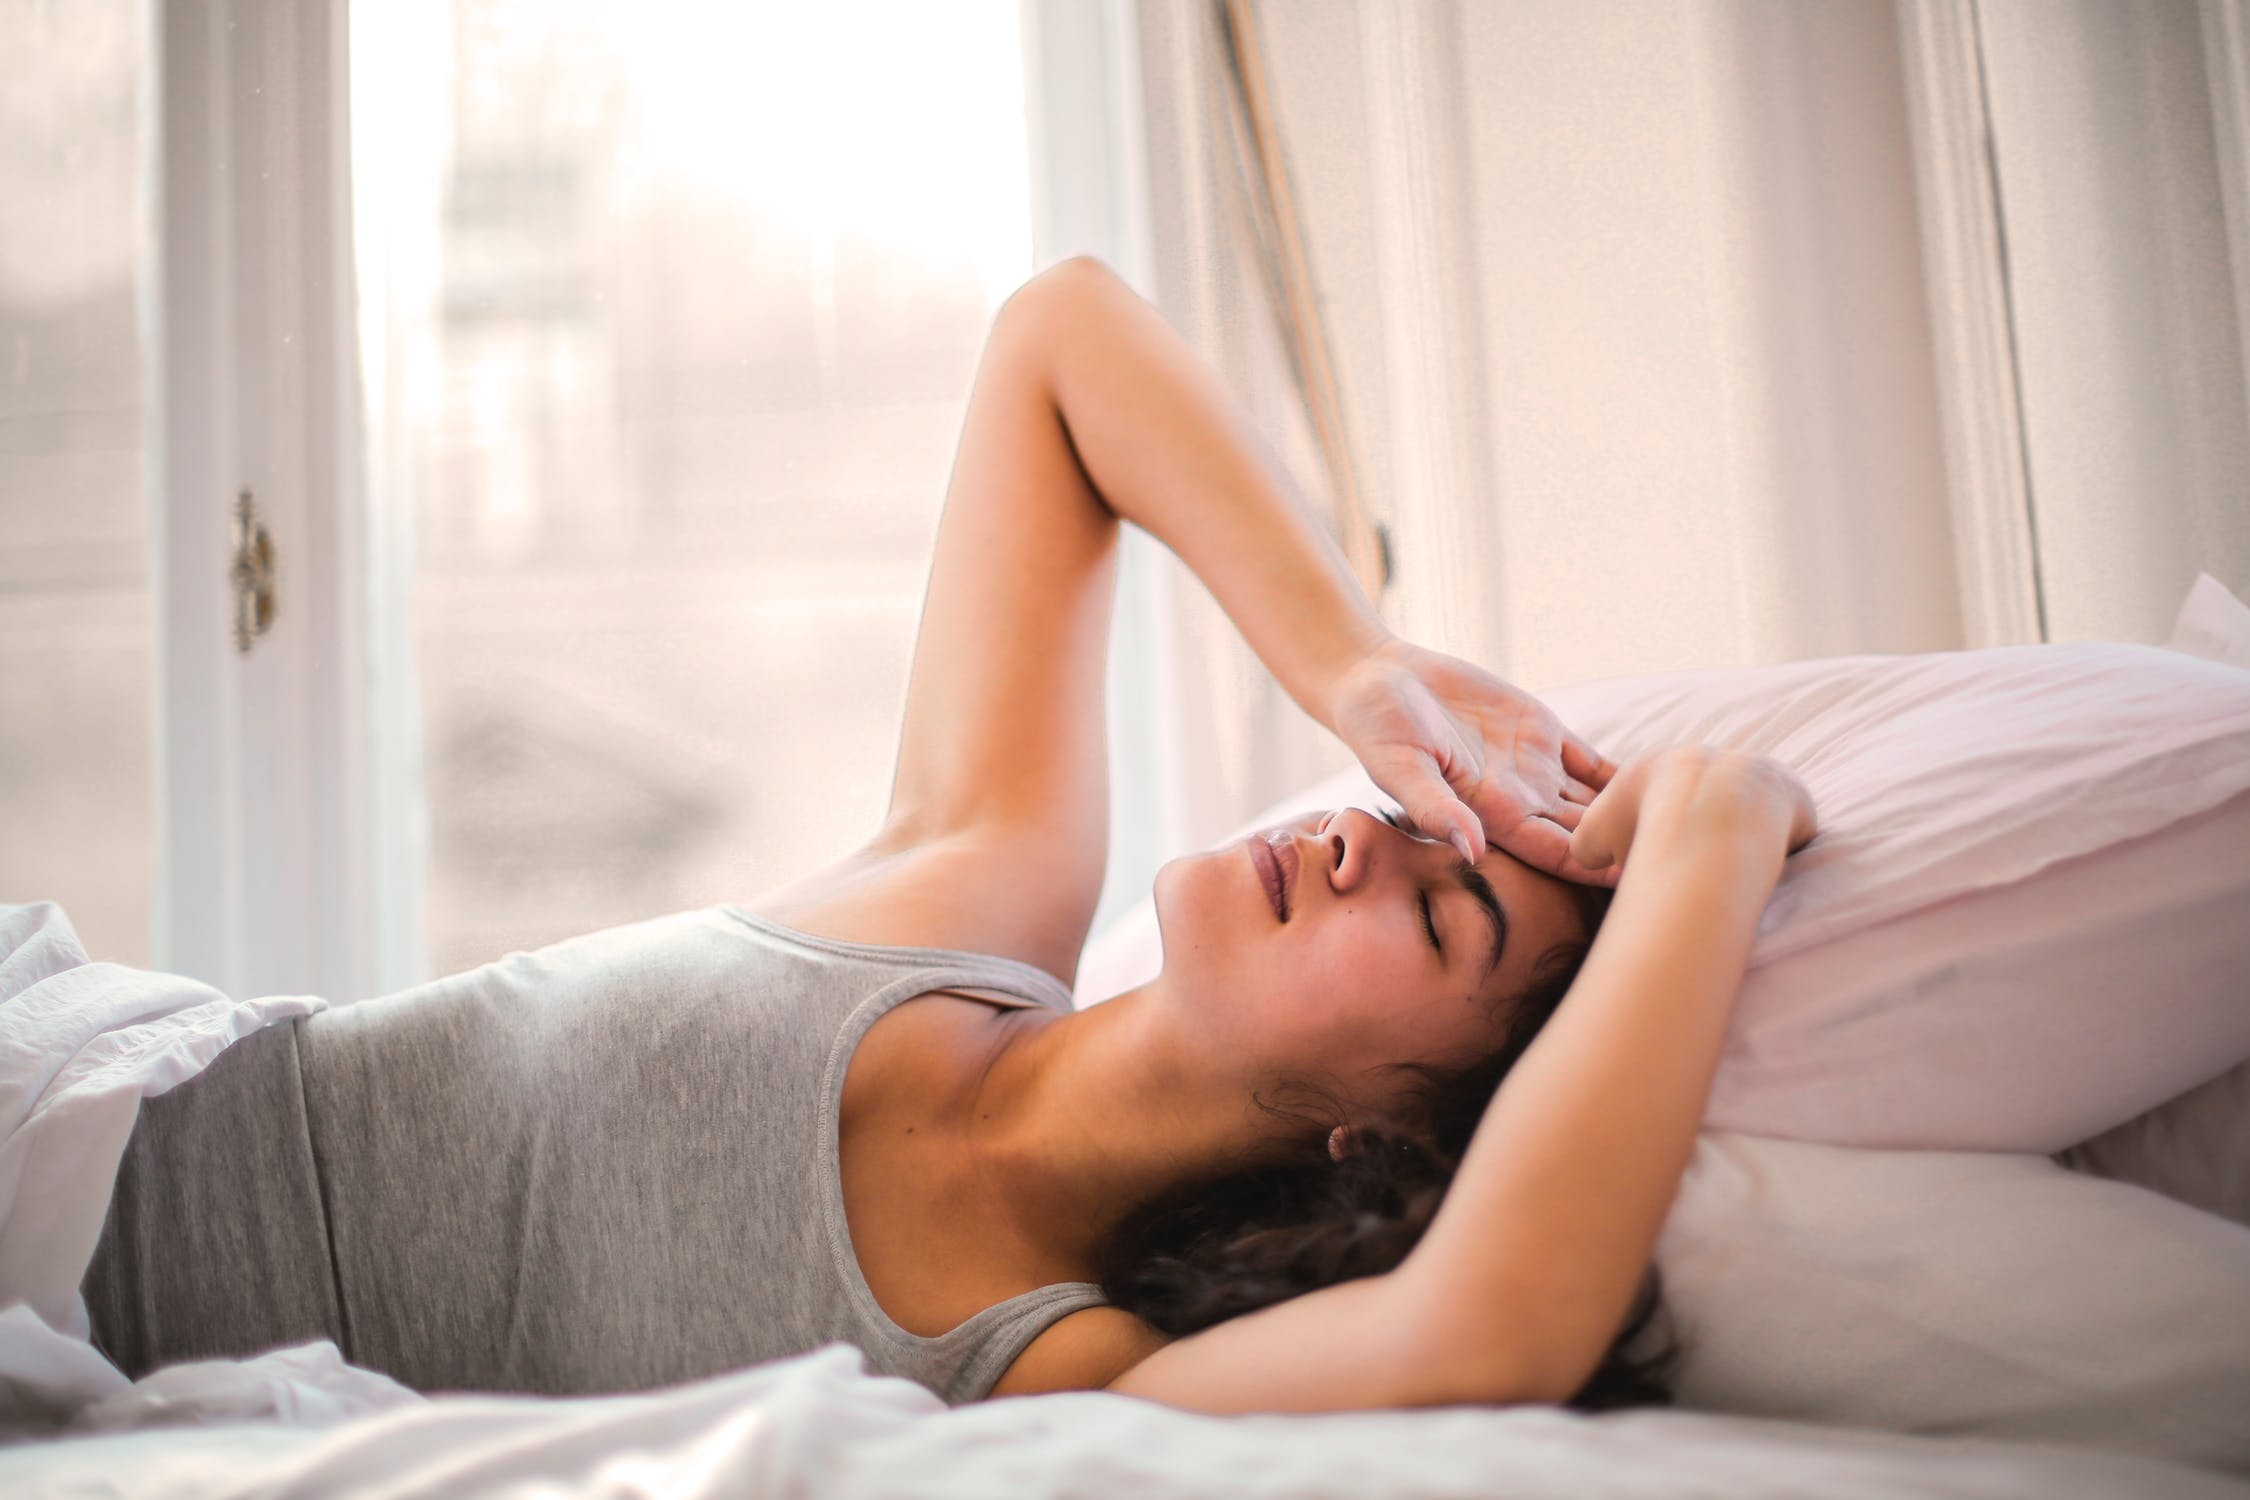 Síndrome premenstrual, ¿cuándo preocuparse?